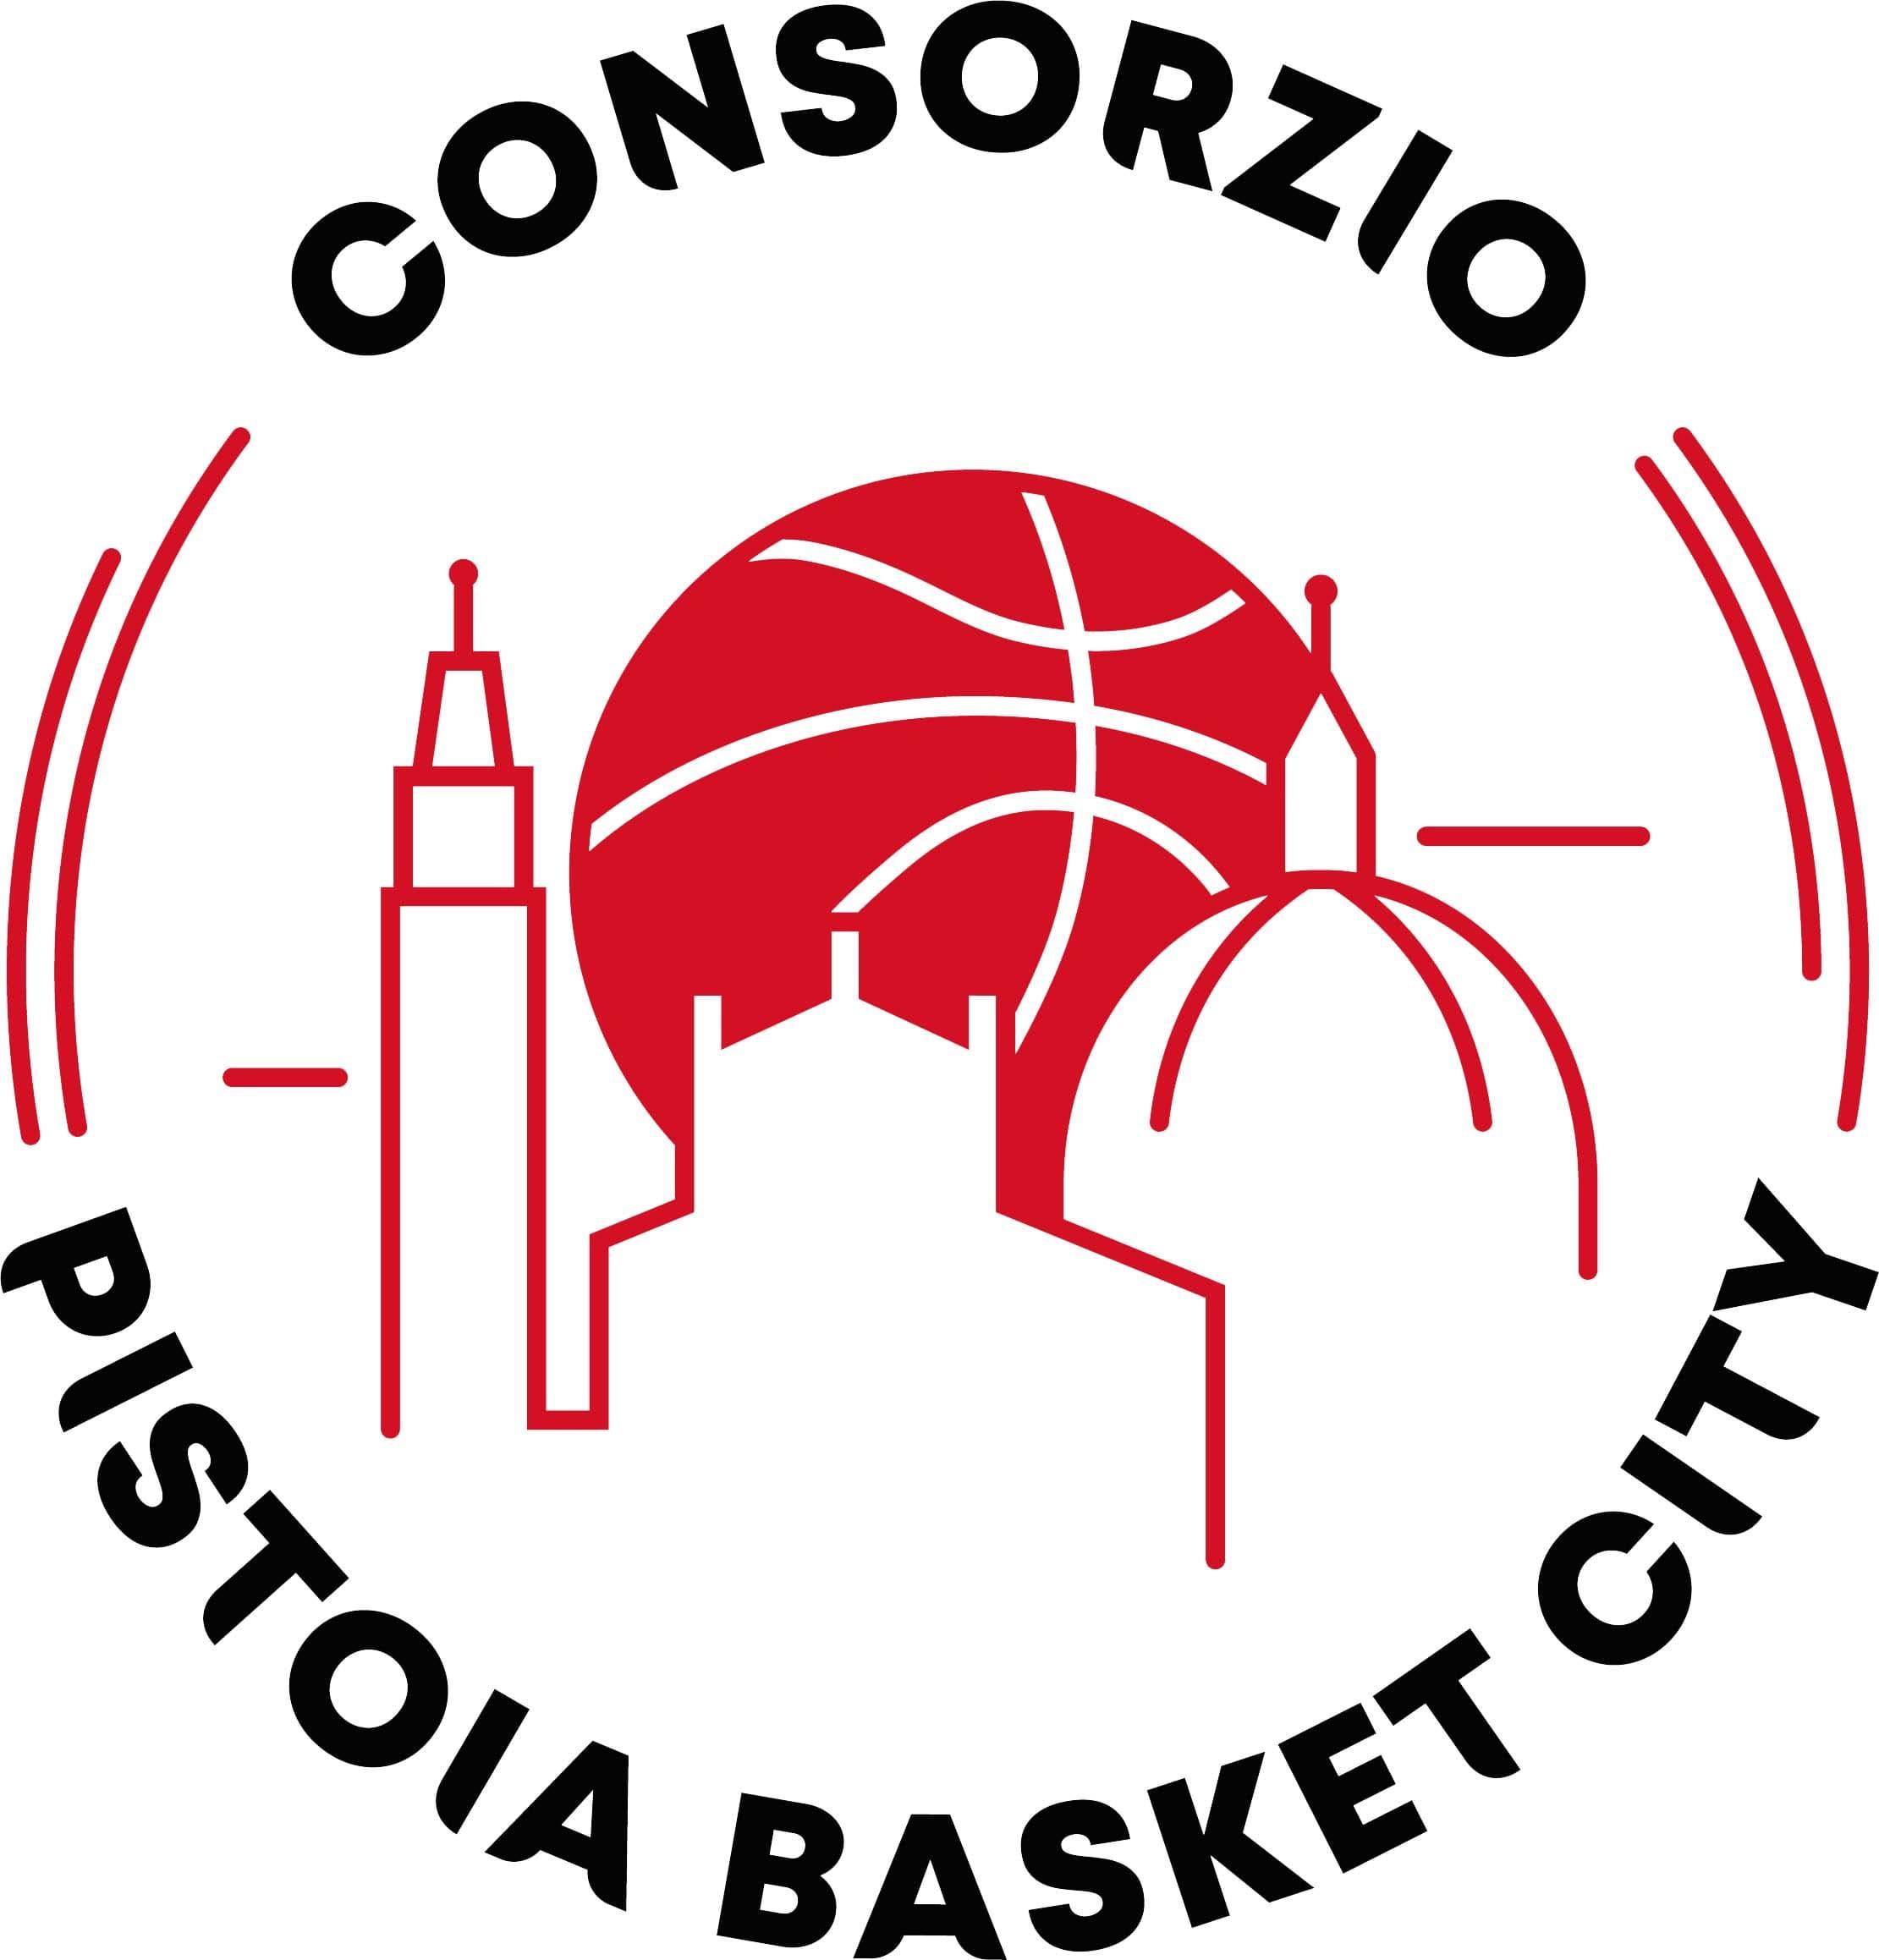 Consorzio Pistoia Basket City